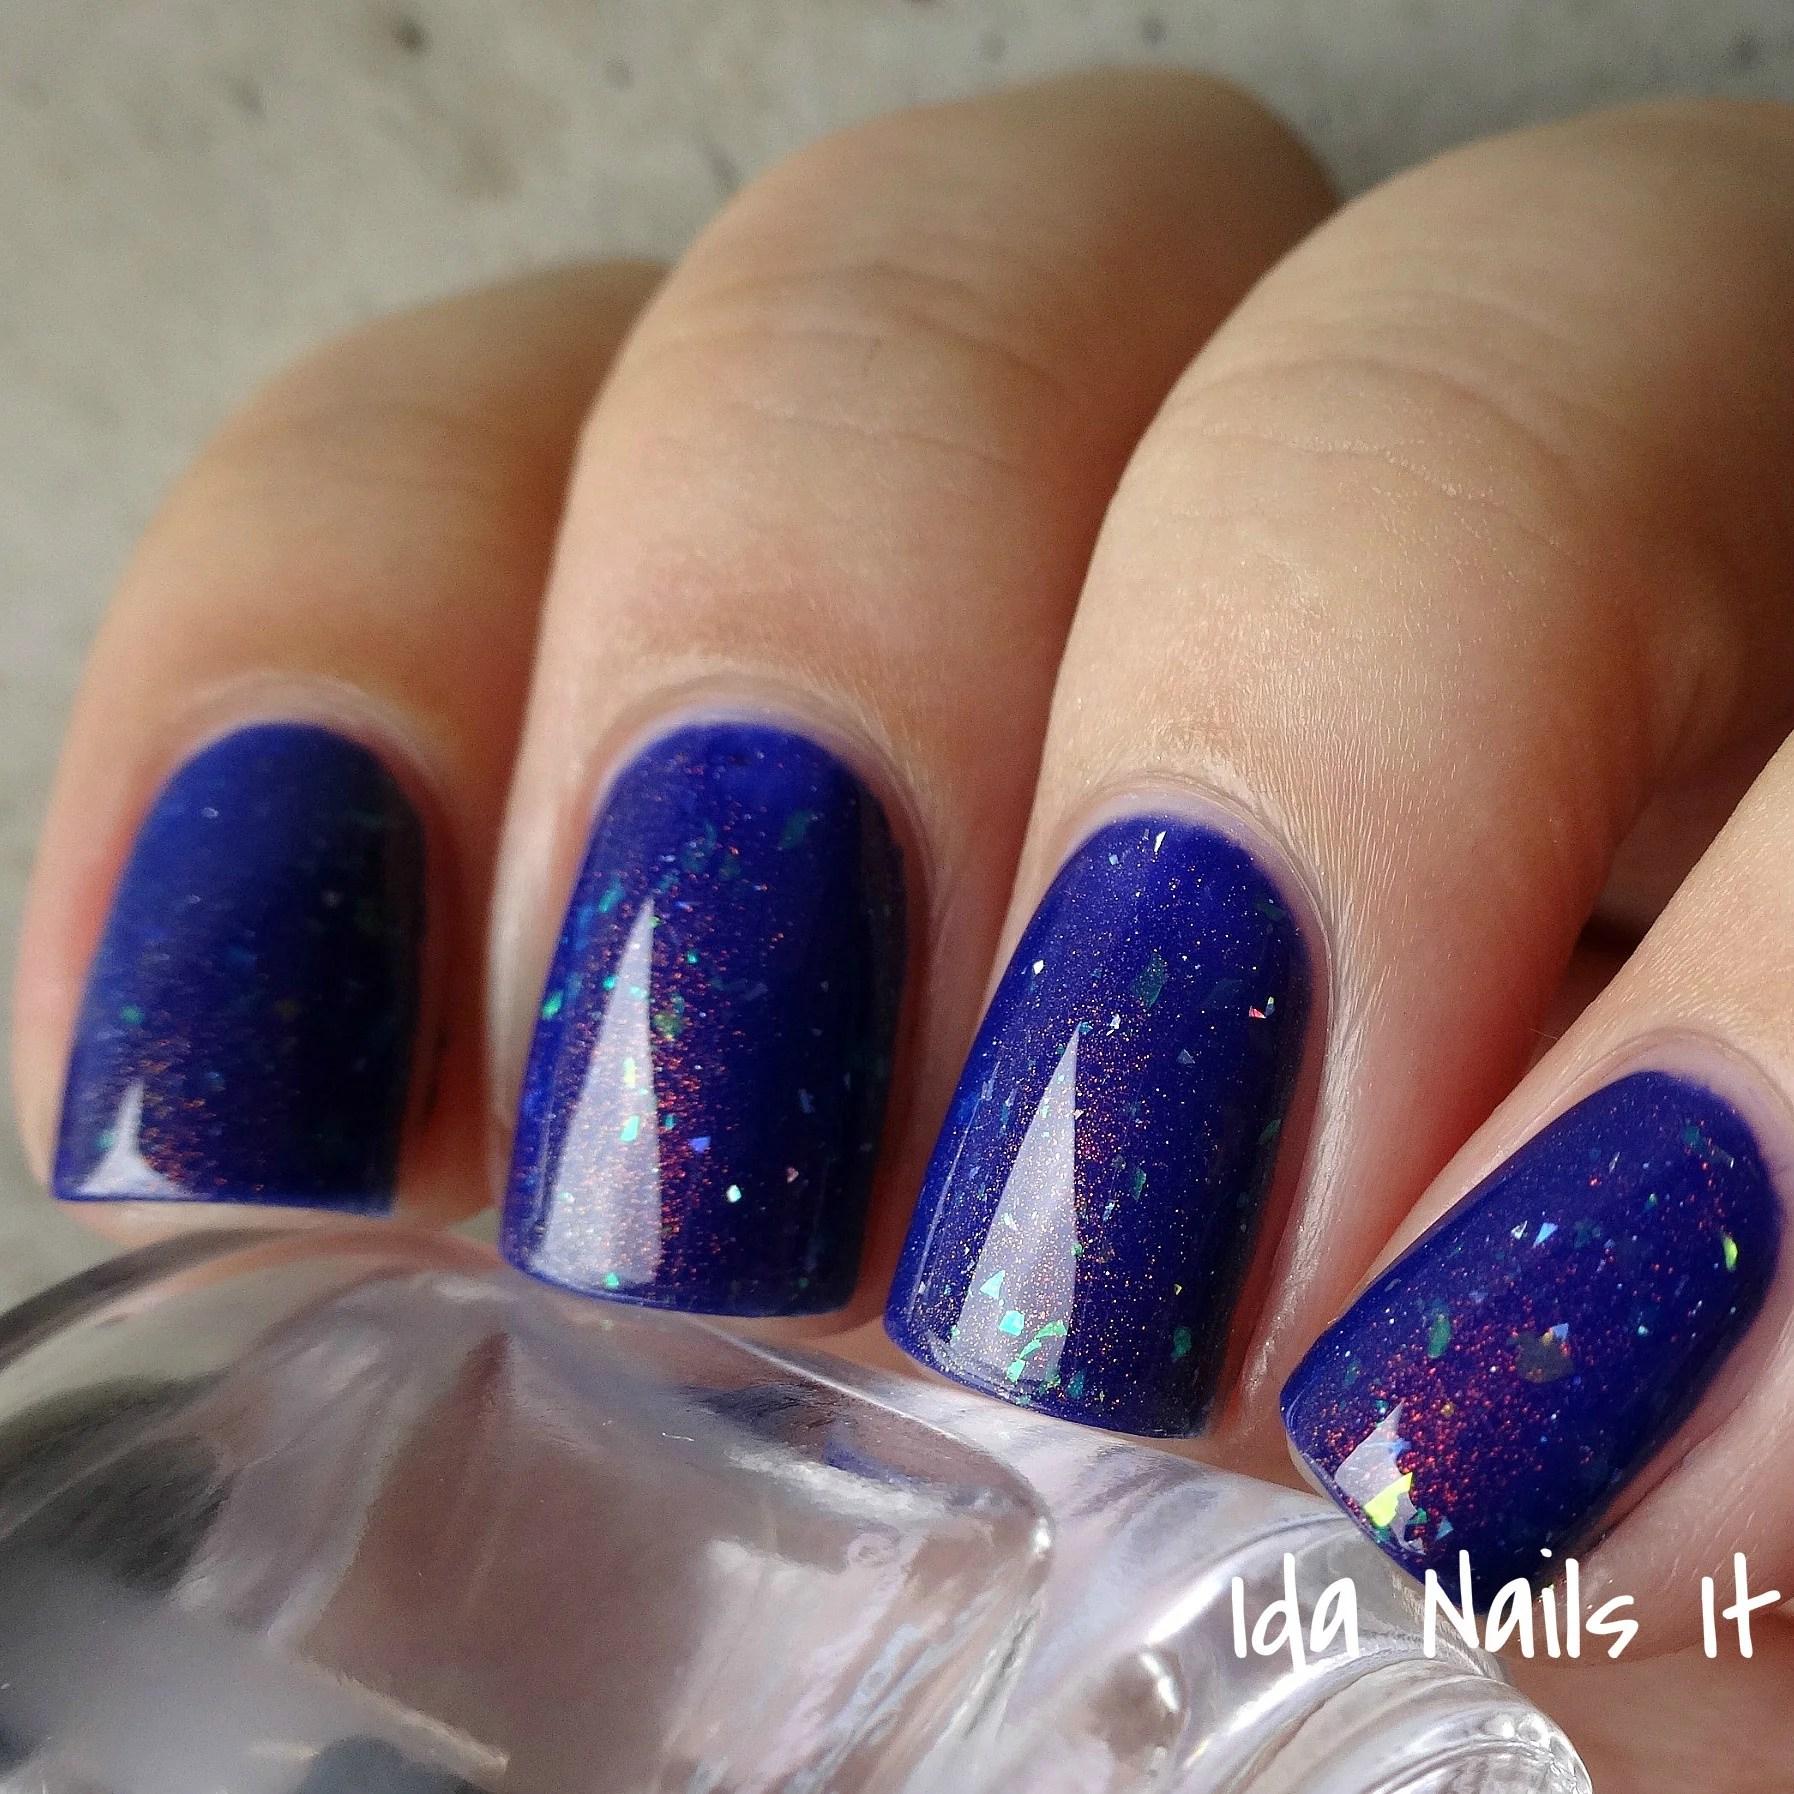 dulcinea - violet jelly polish